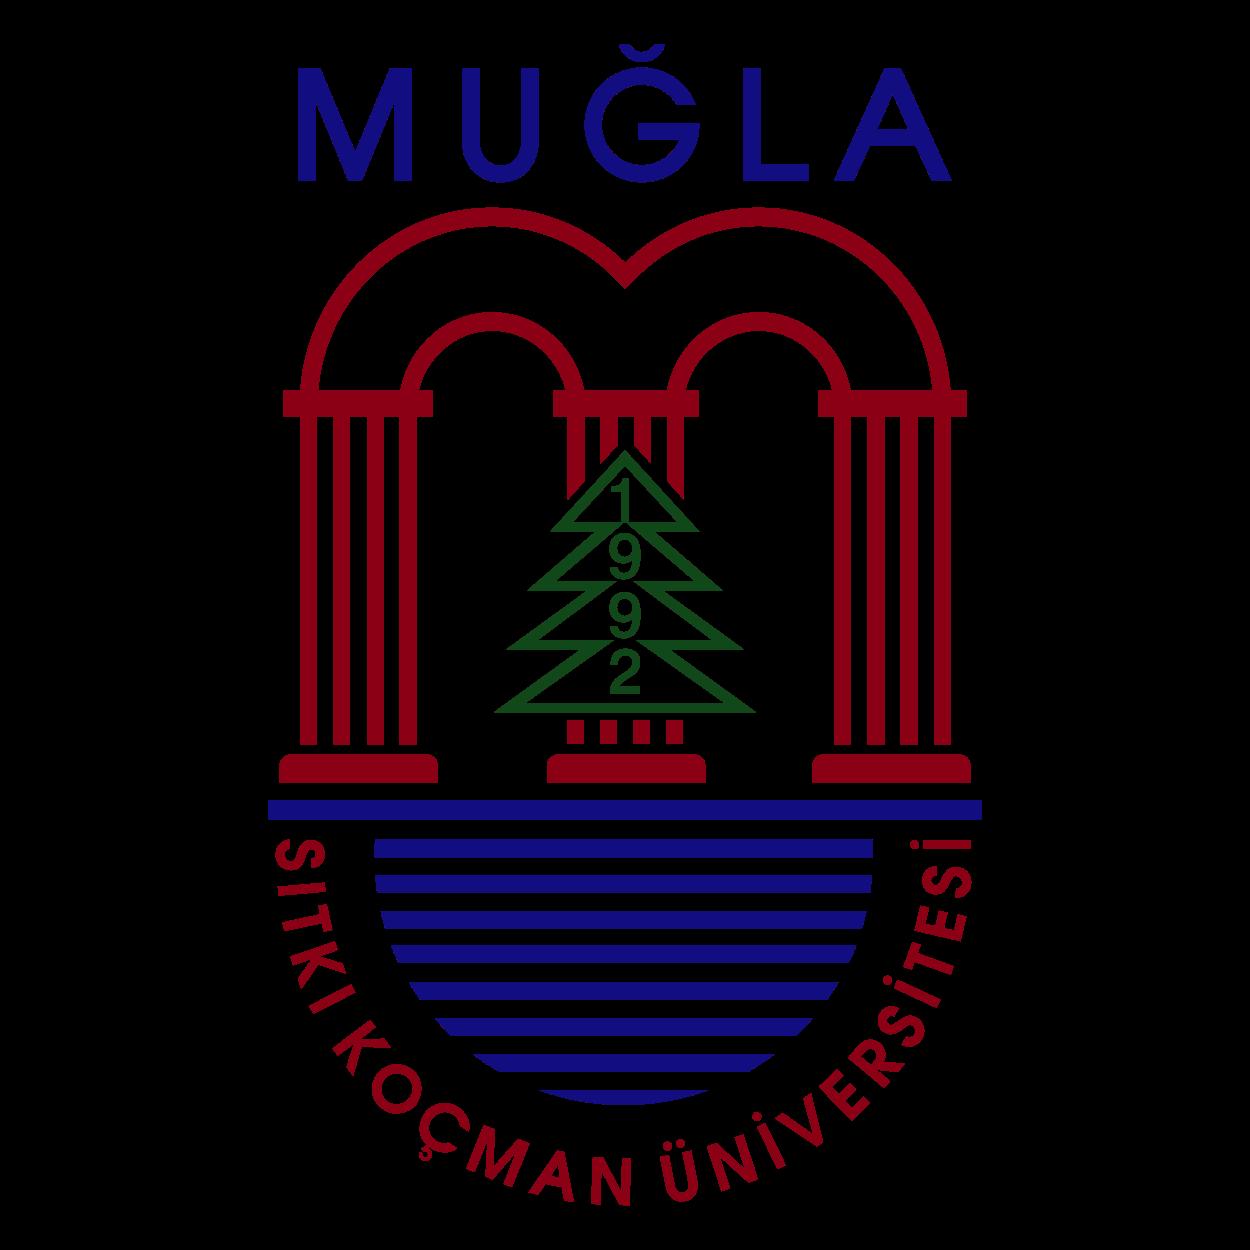 Muğla Sıtkı Koçman Üniversitesi Logo png